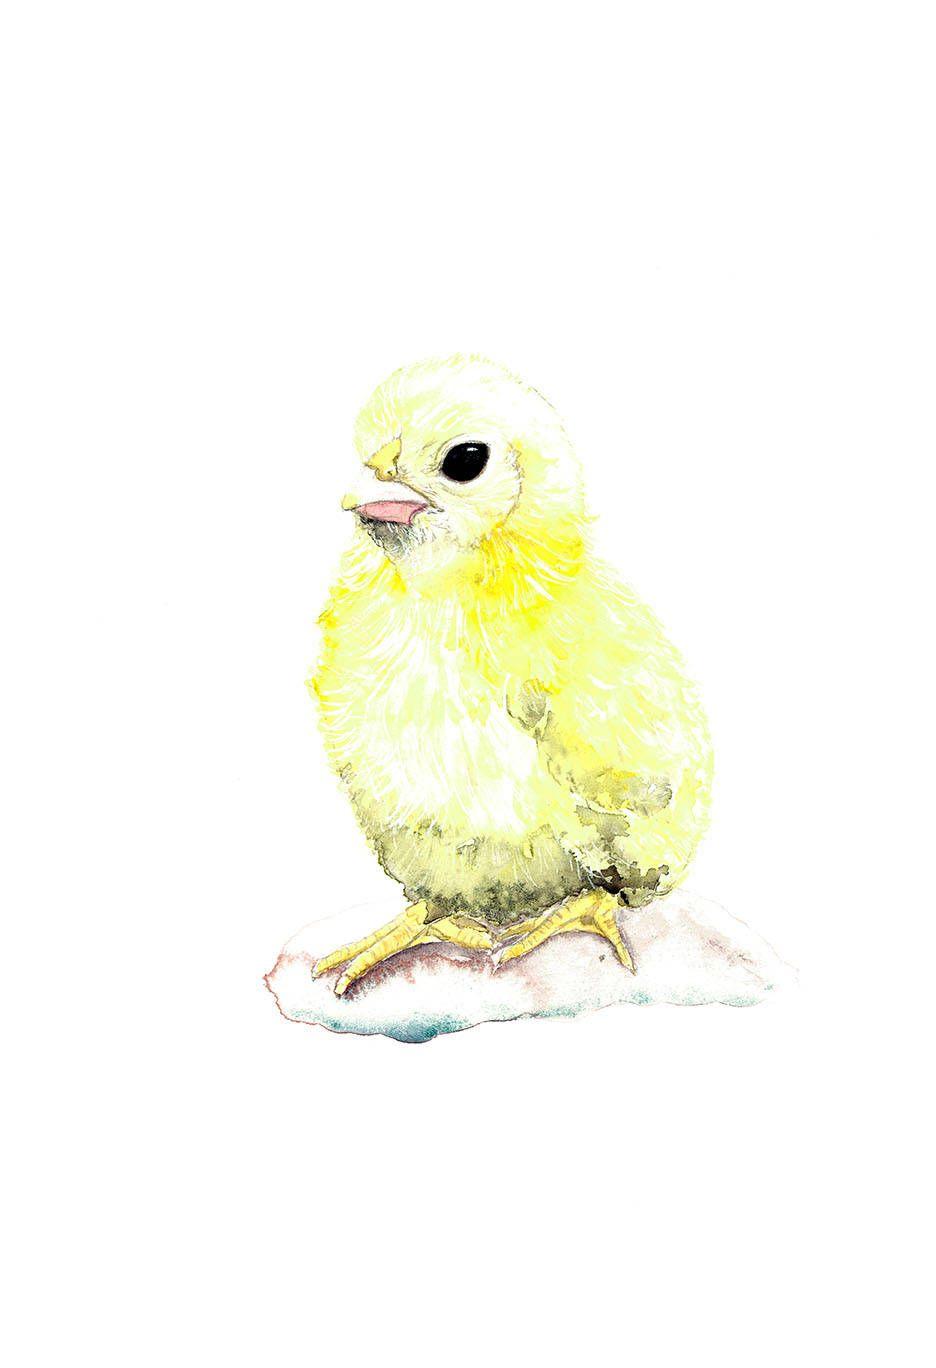 Yellow Chick Print, Chick Watercolor, Nursery Wall Art, Farm Animal ...